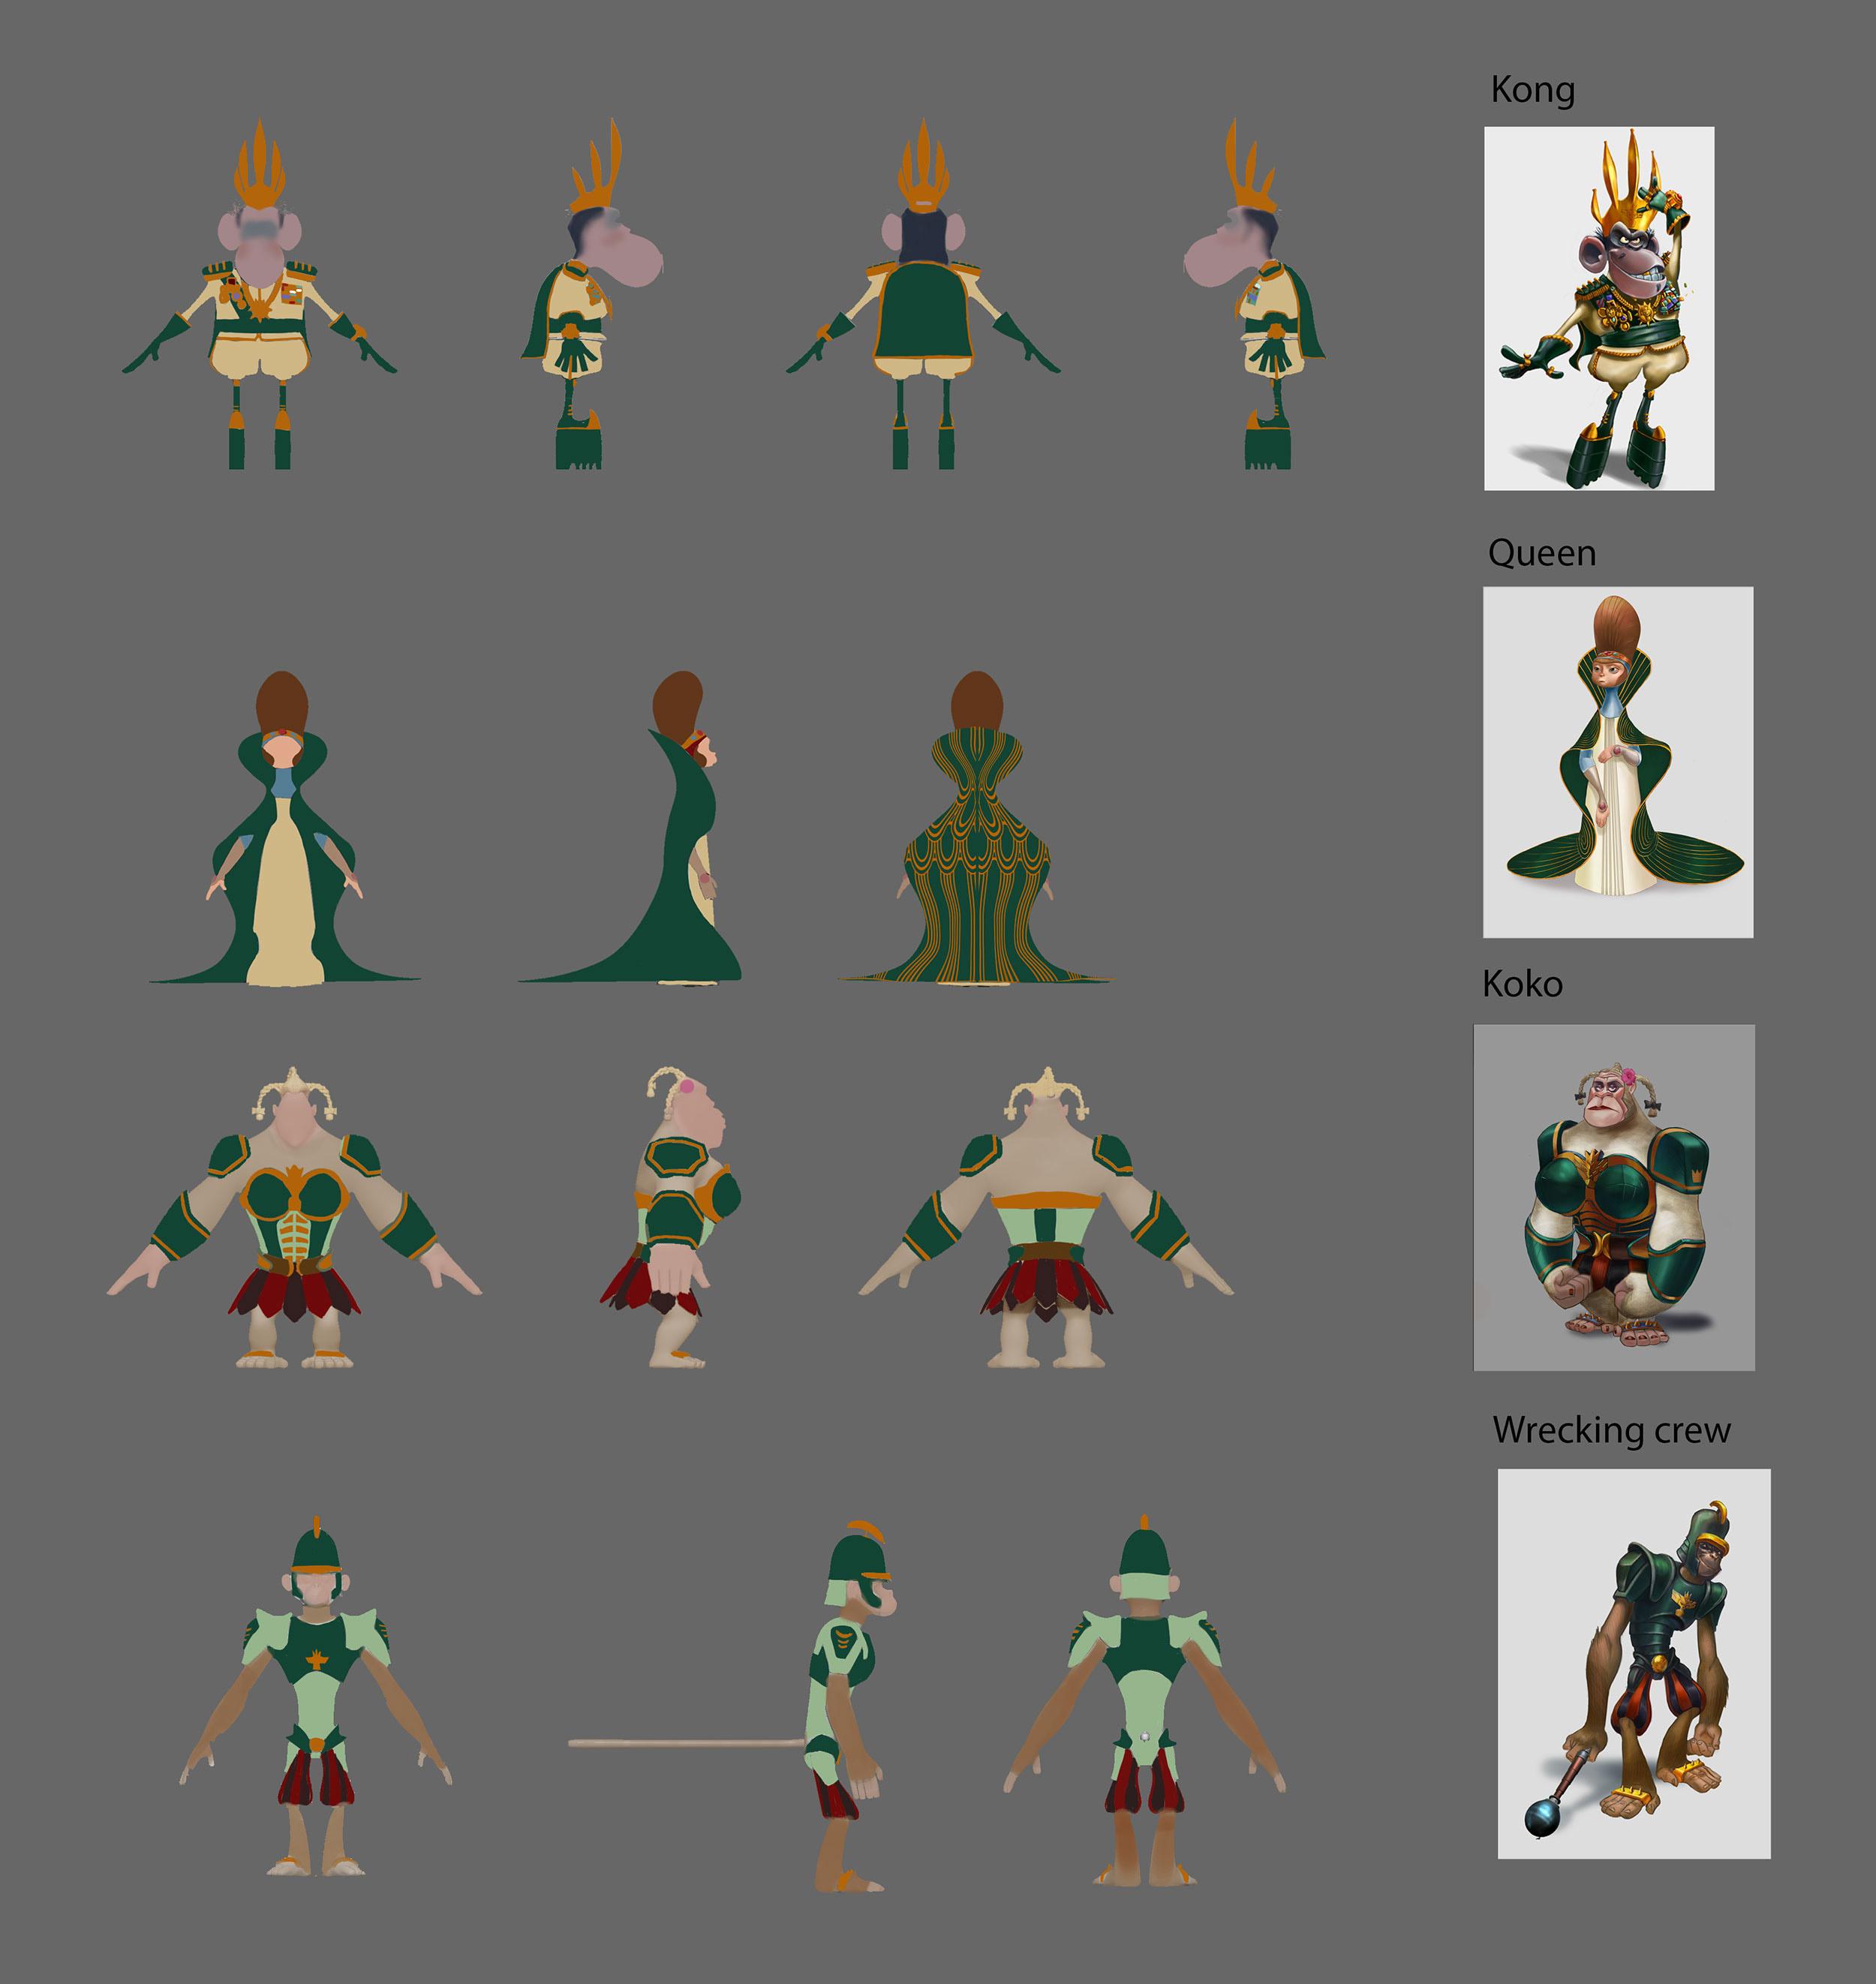 Kong-group-color-key-copy_zps6b11406e.jpg